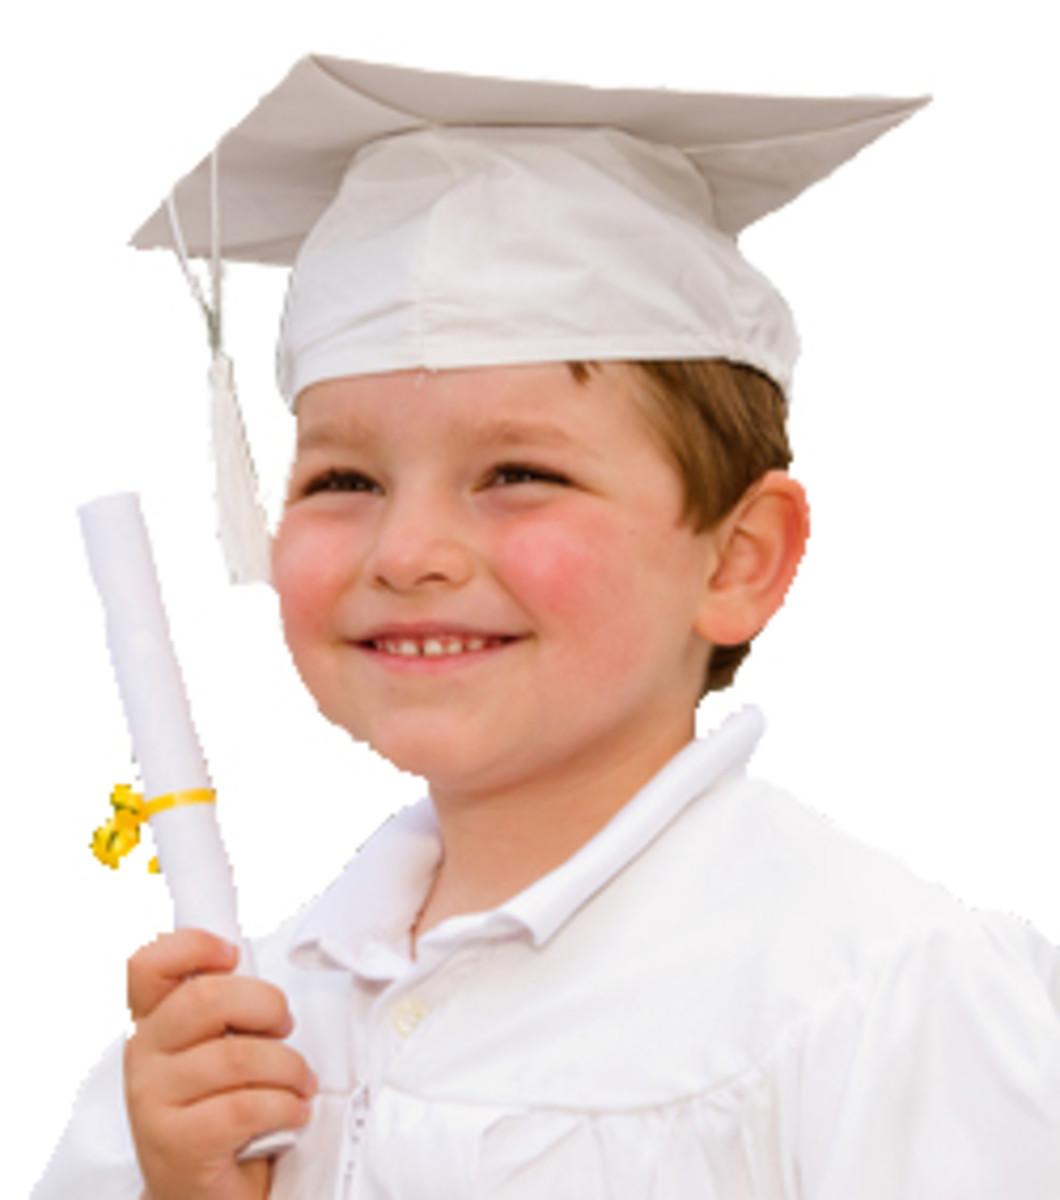 KIndergarden Graduation Bachelor of Rhymes